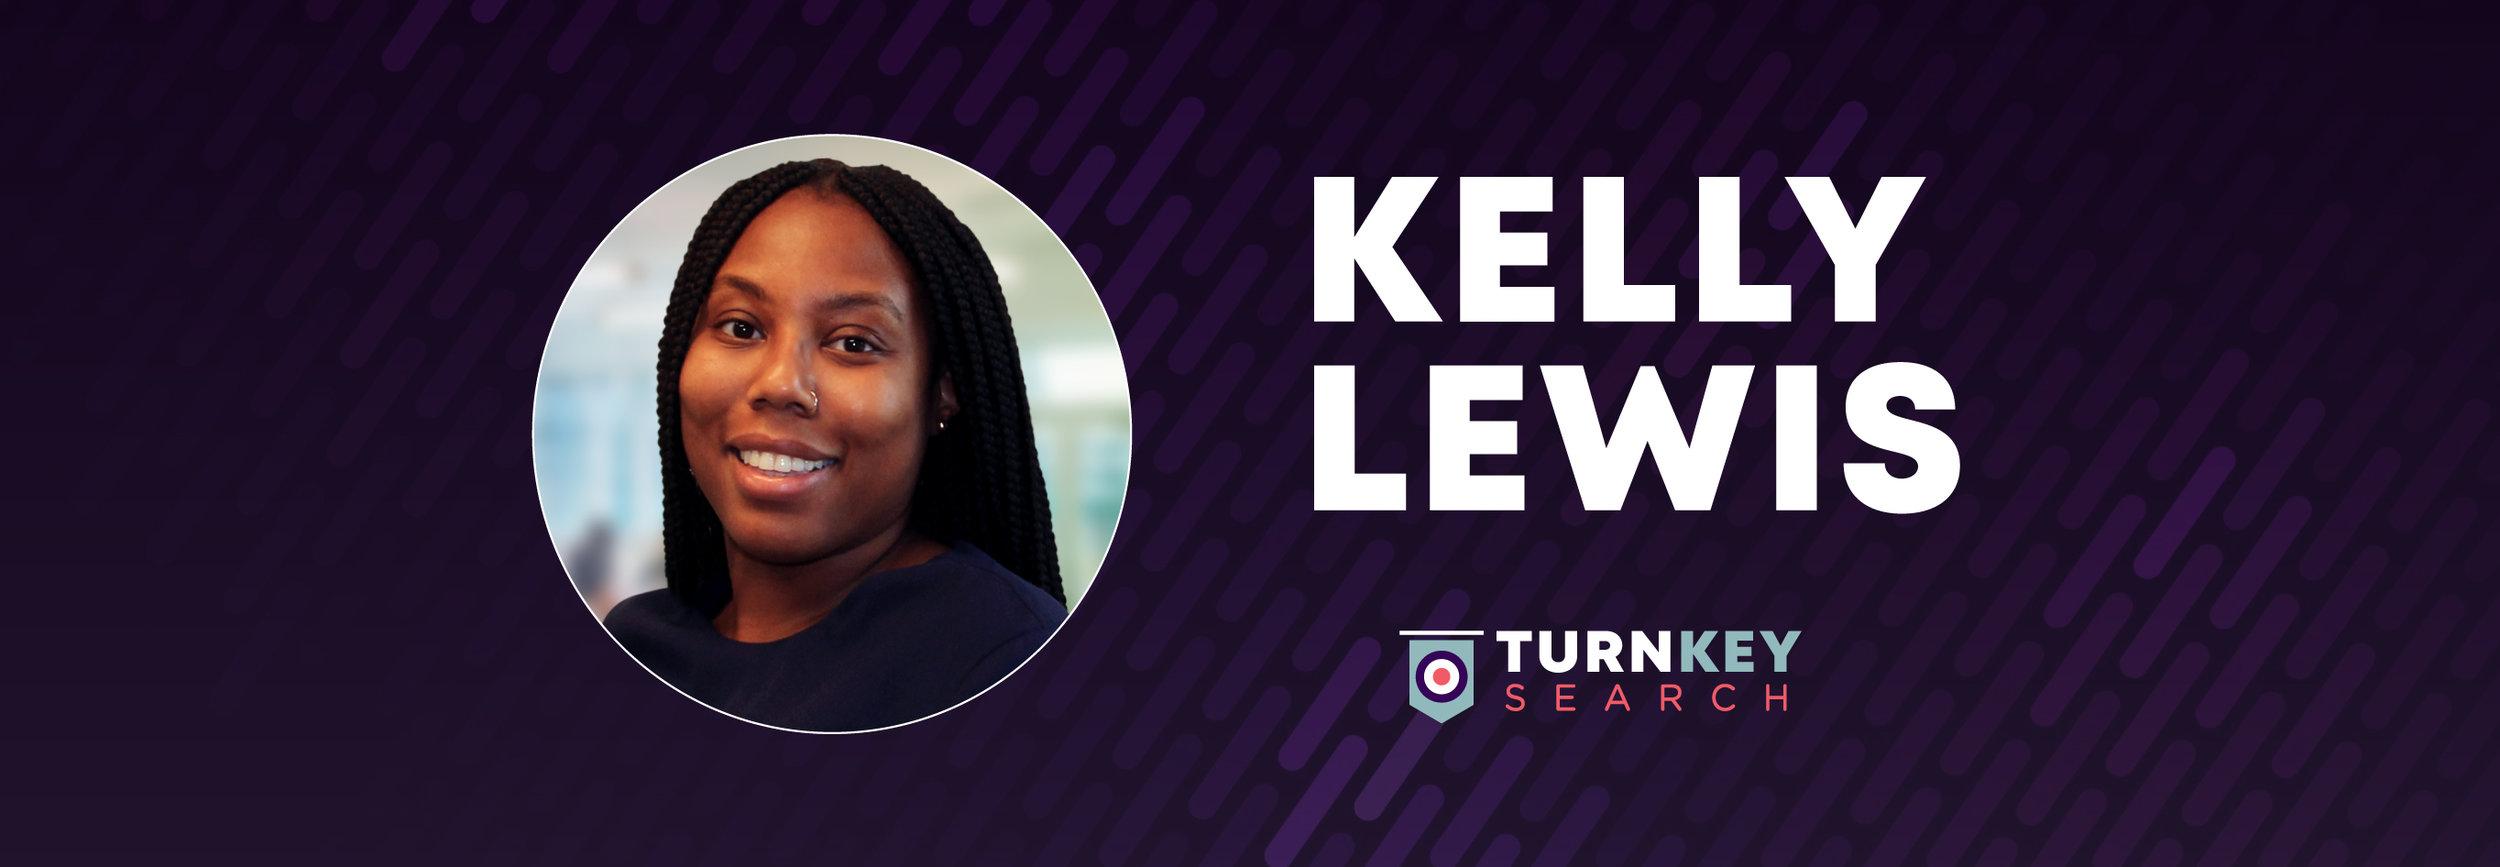 Kelly-Lewis-Turnkey Search.jpg